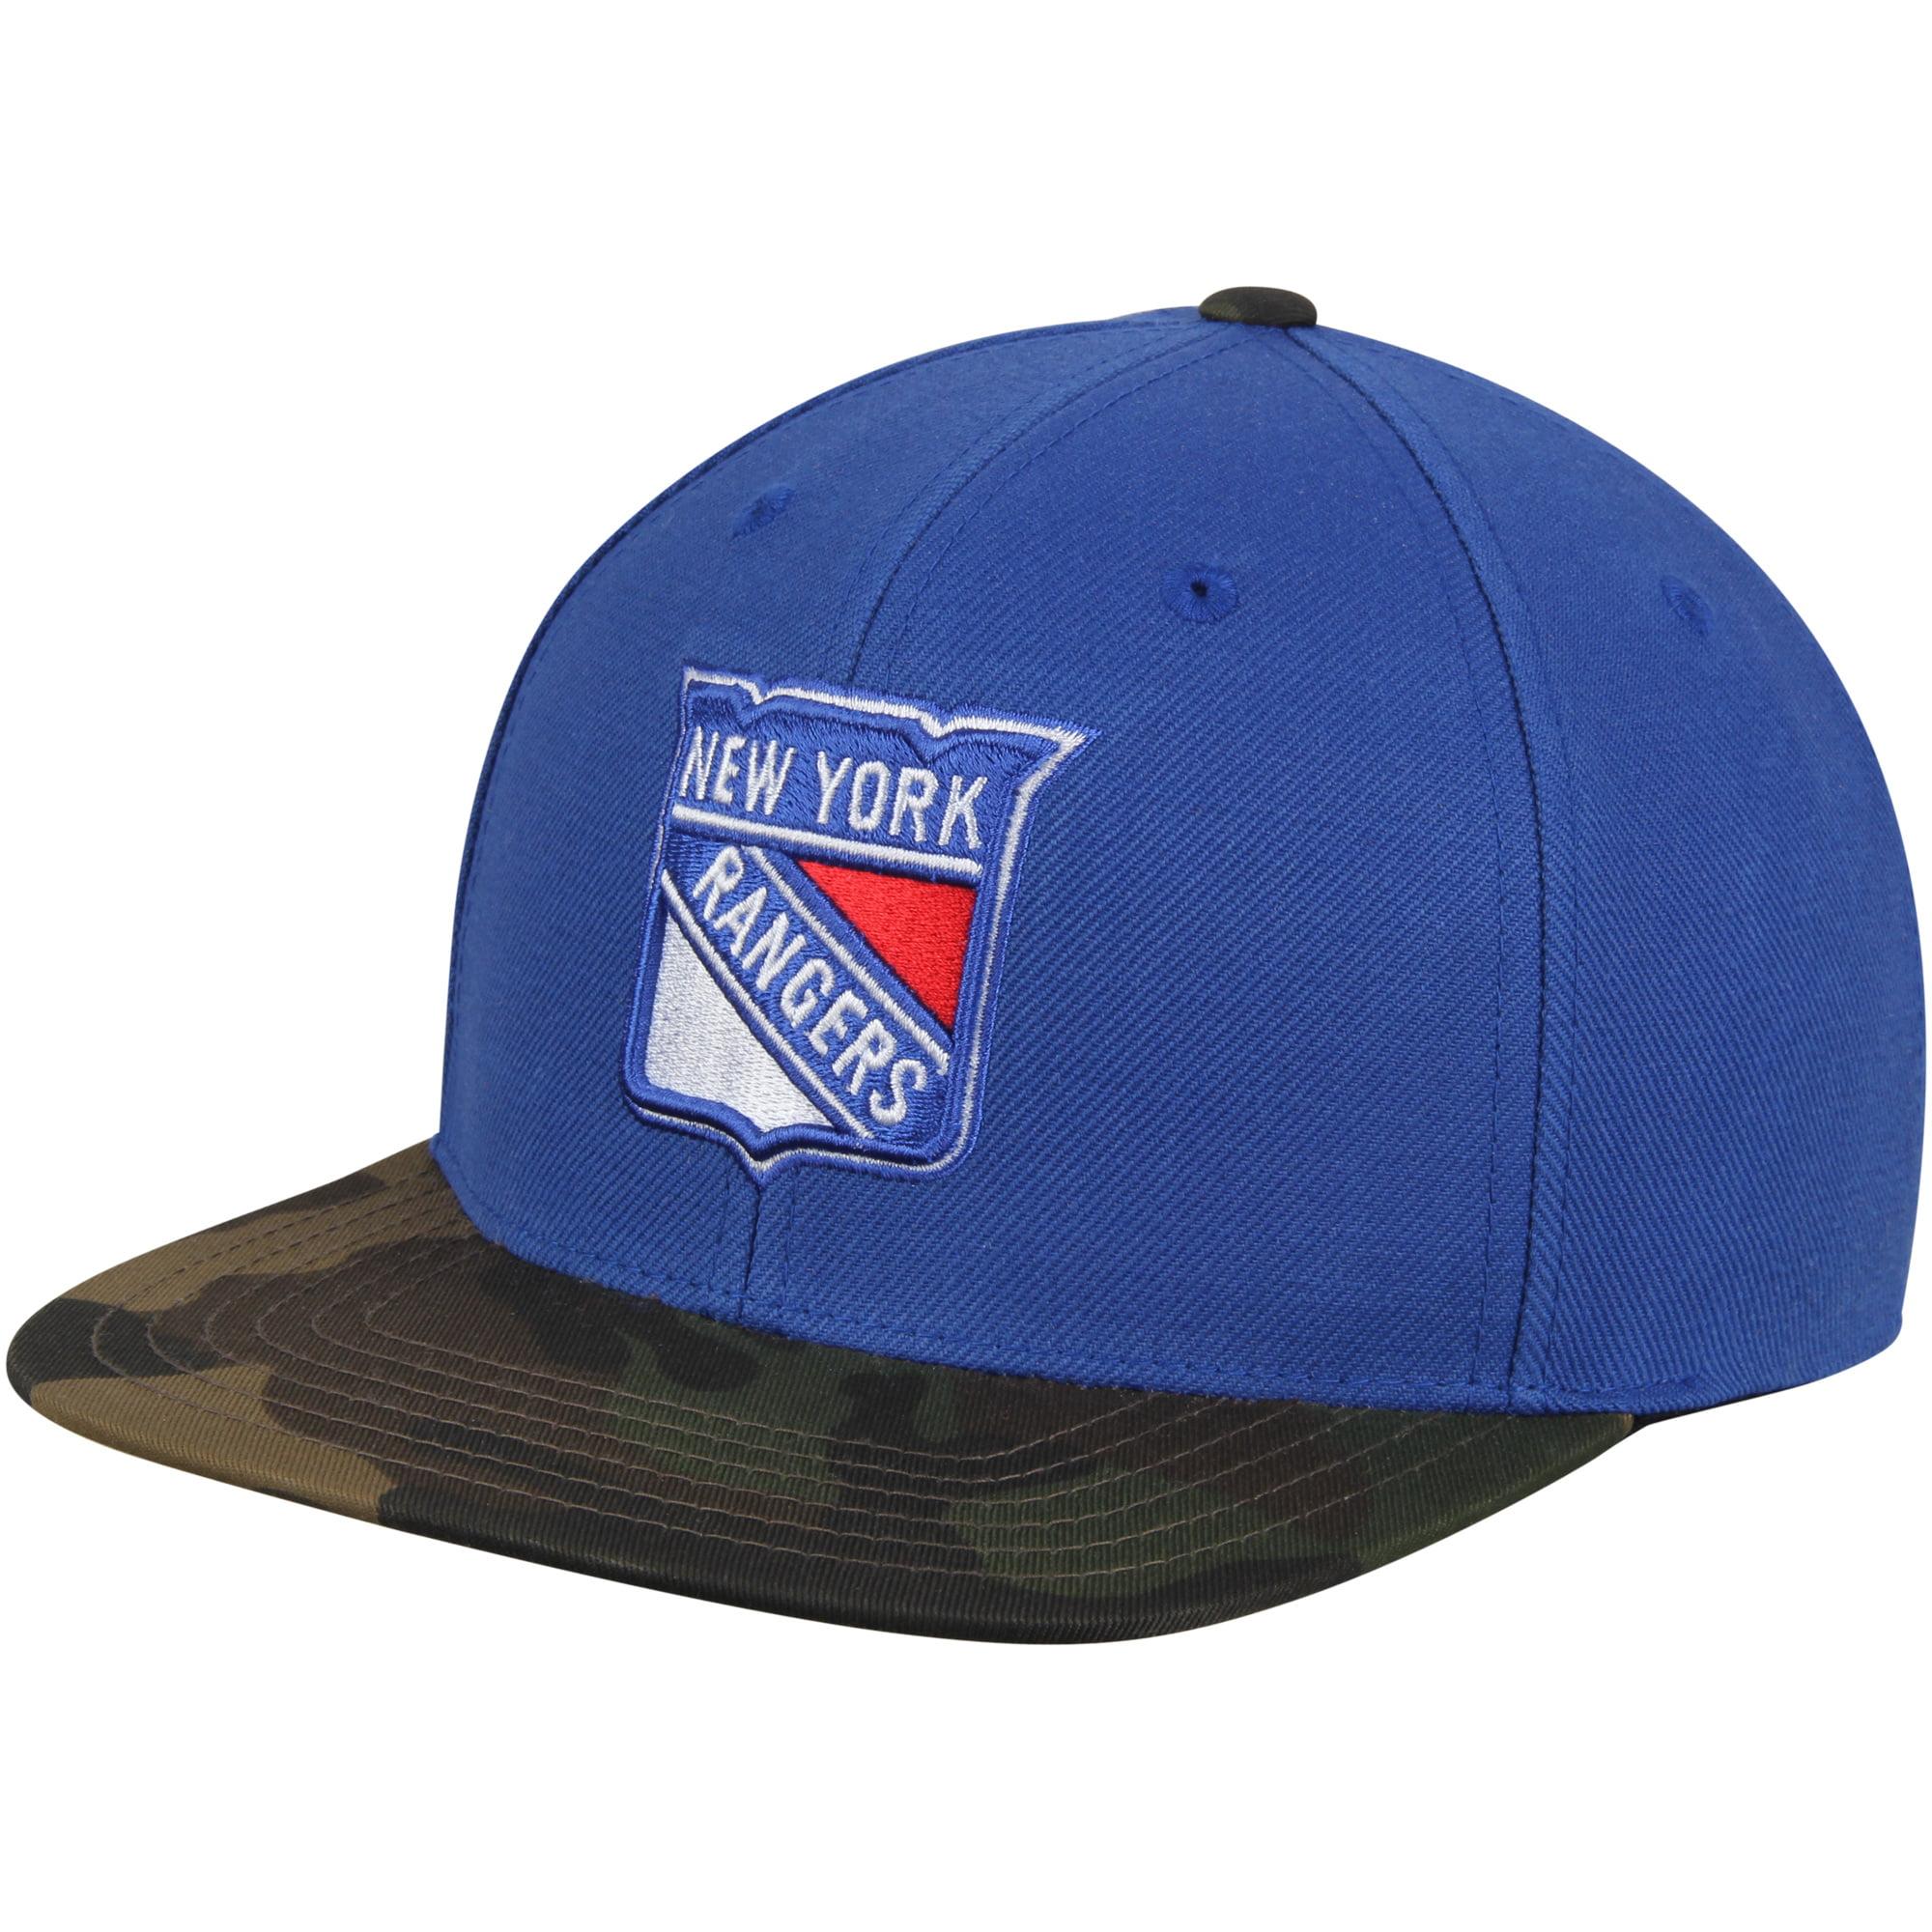 New York Rangers American Needle Sundown Snapback Adjustable Hat - Blue - OSFA